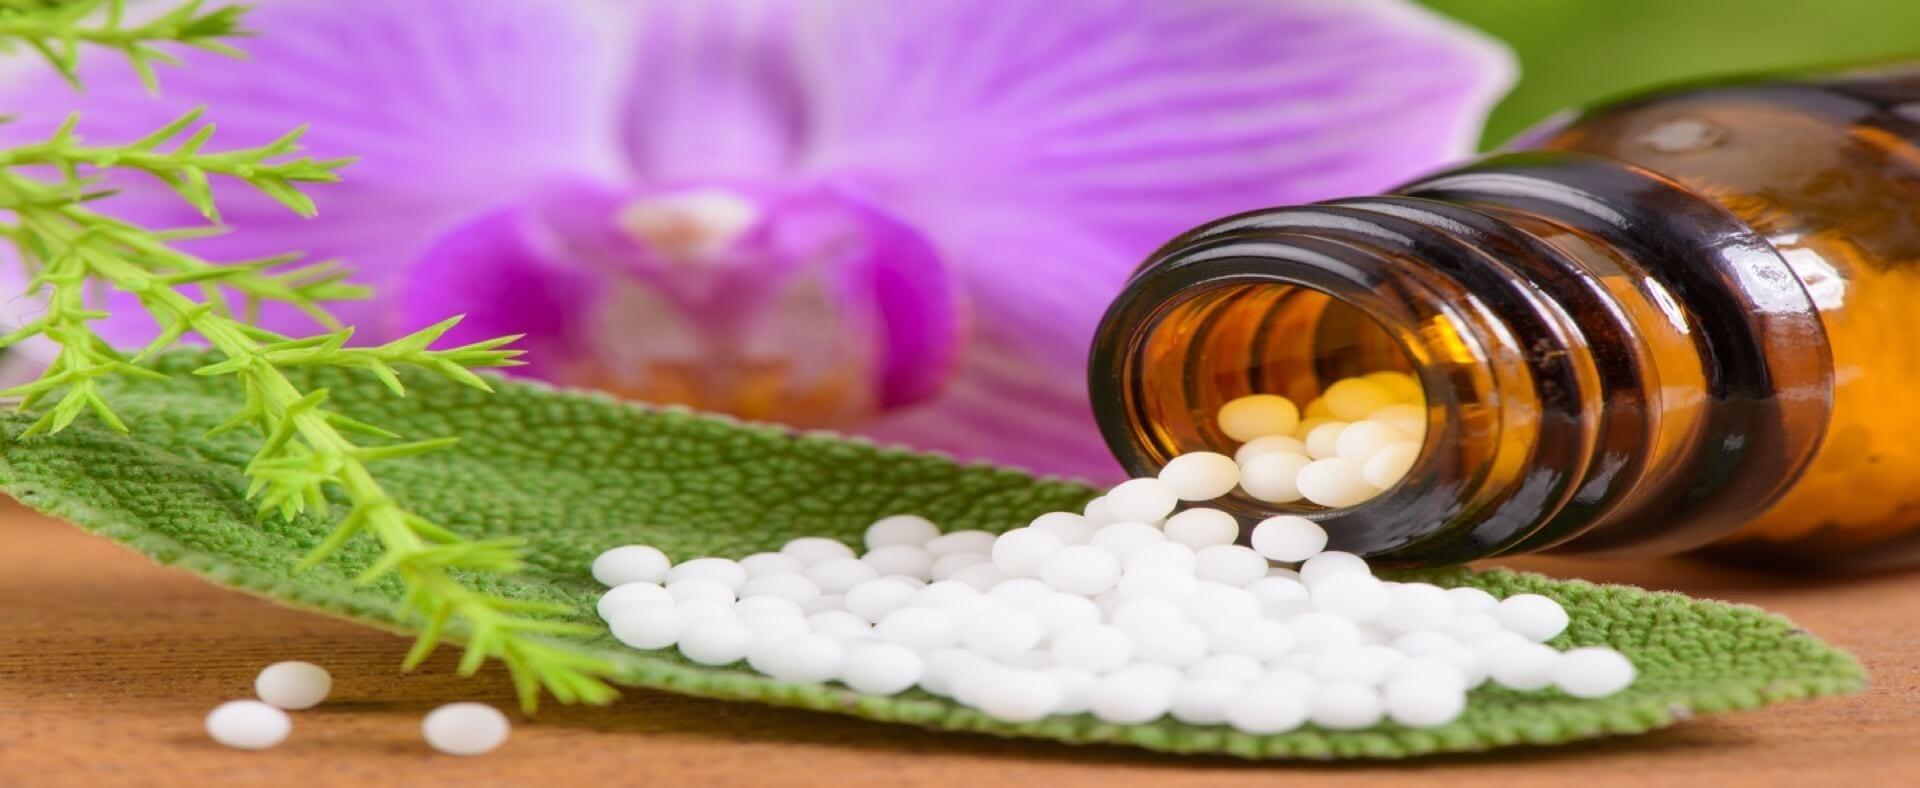 Homeopathy: Valid or Placebo? | Dr. Jiwani Naturopathic Vancouver Burnaby Surrey